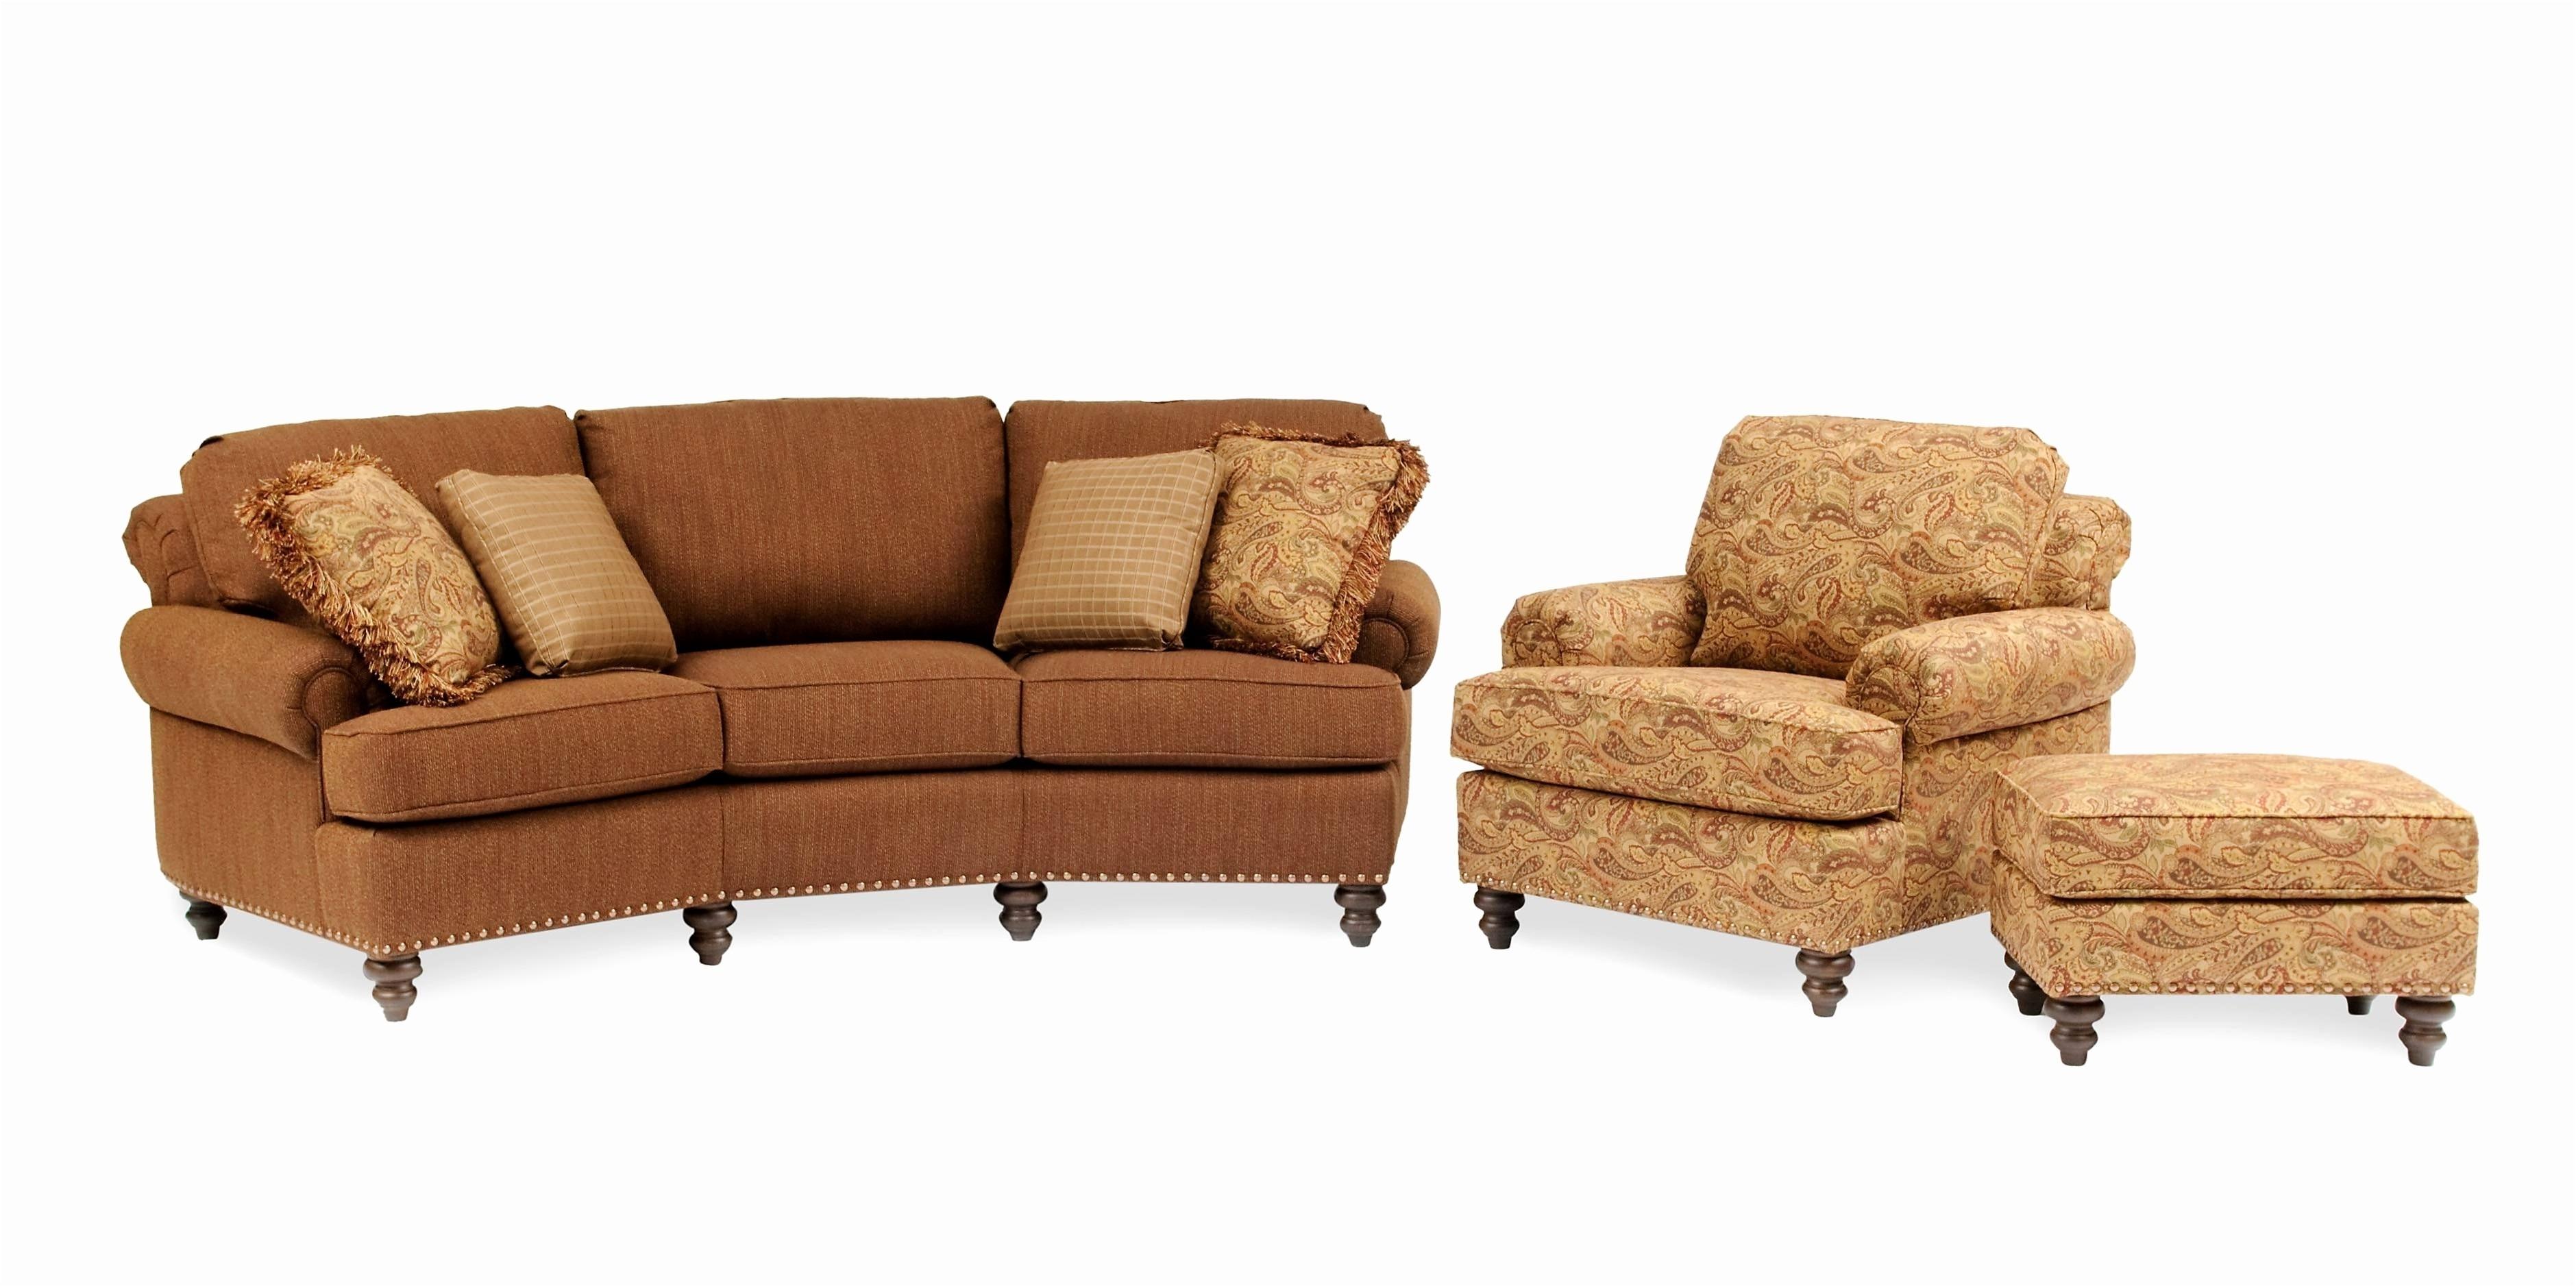 Sofa : Nebraska Furniture Mart Sectional Sofa Cinematic Everest With 2018 Nebraska Furniture Mart Sectional Sofas (View 16 of 20)